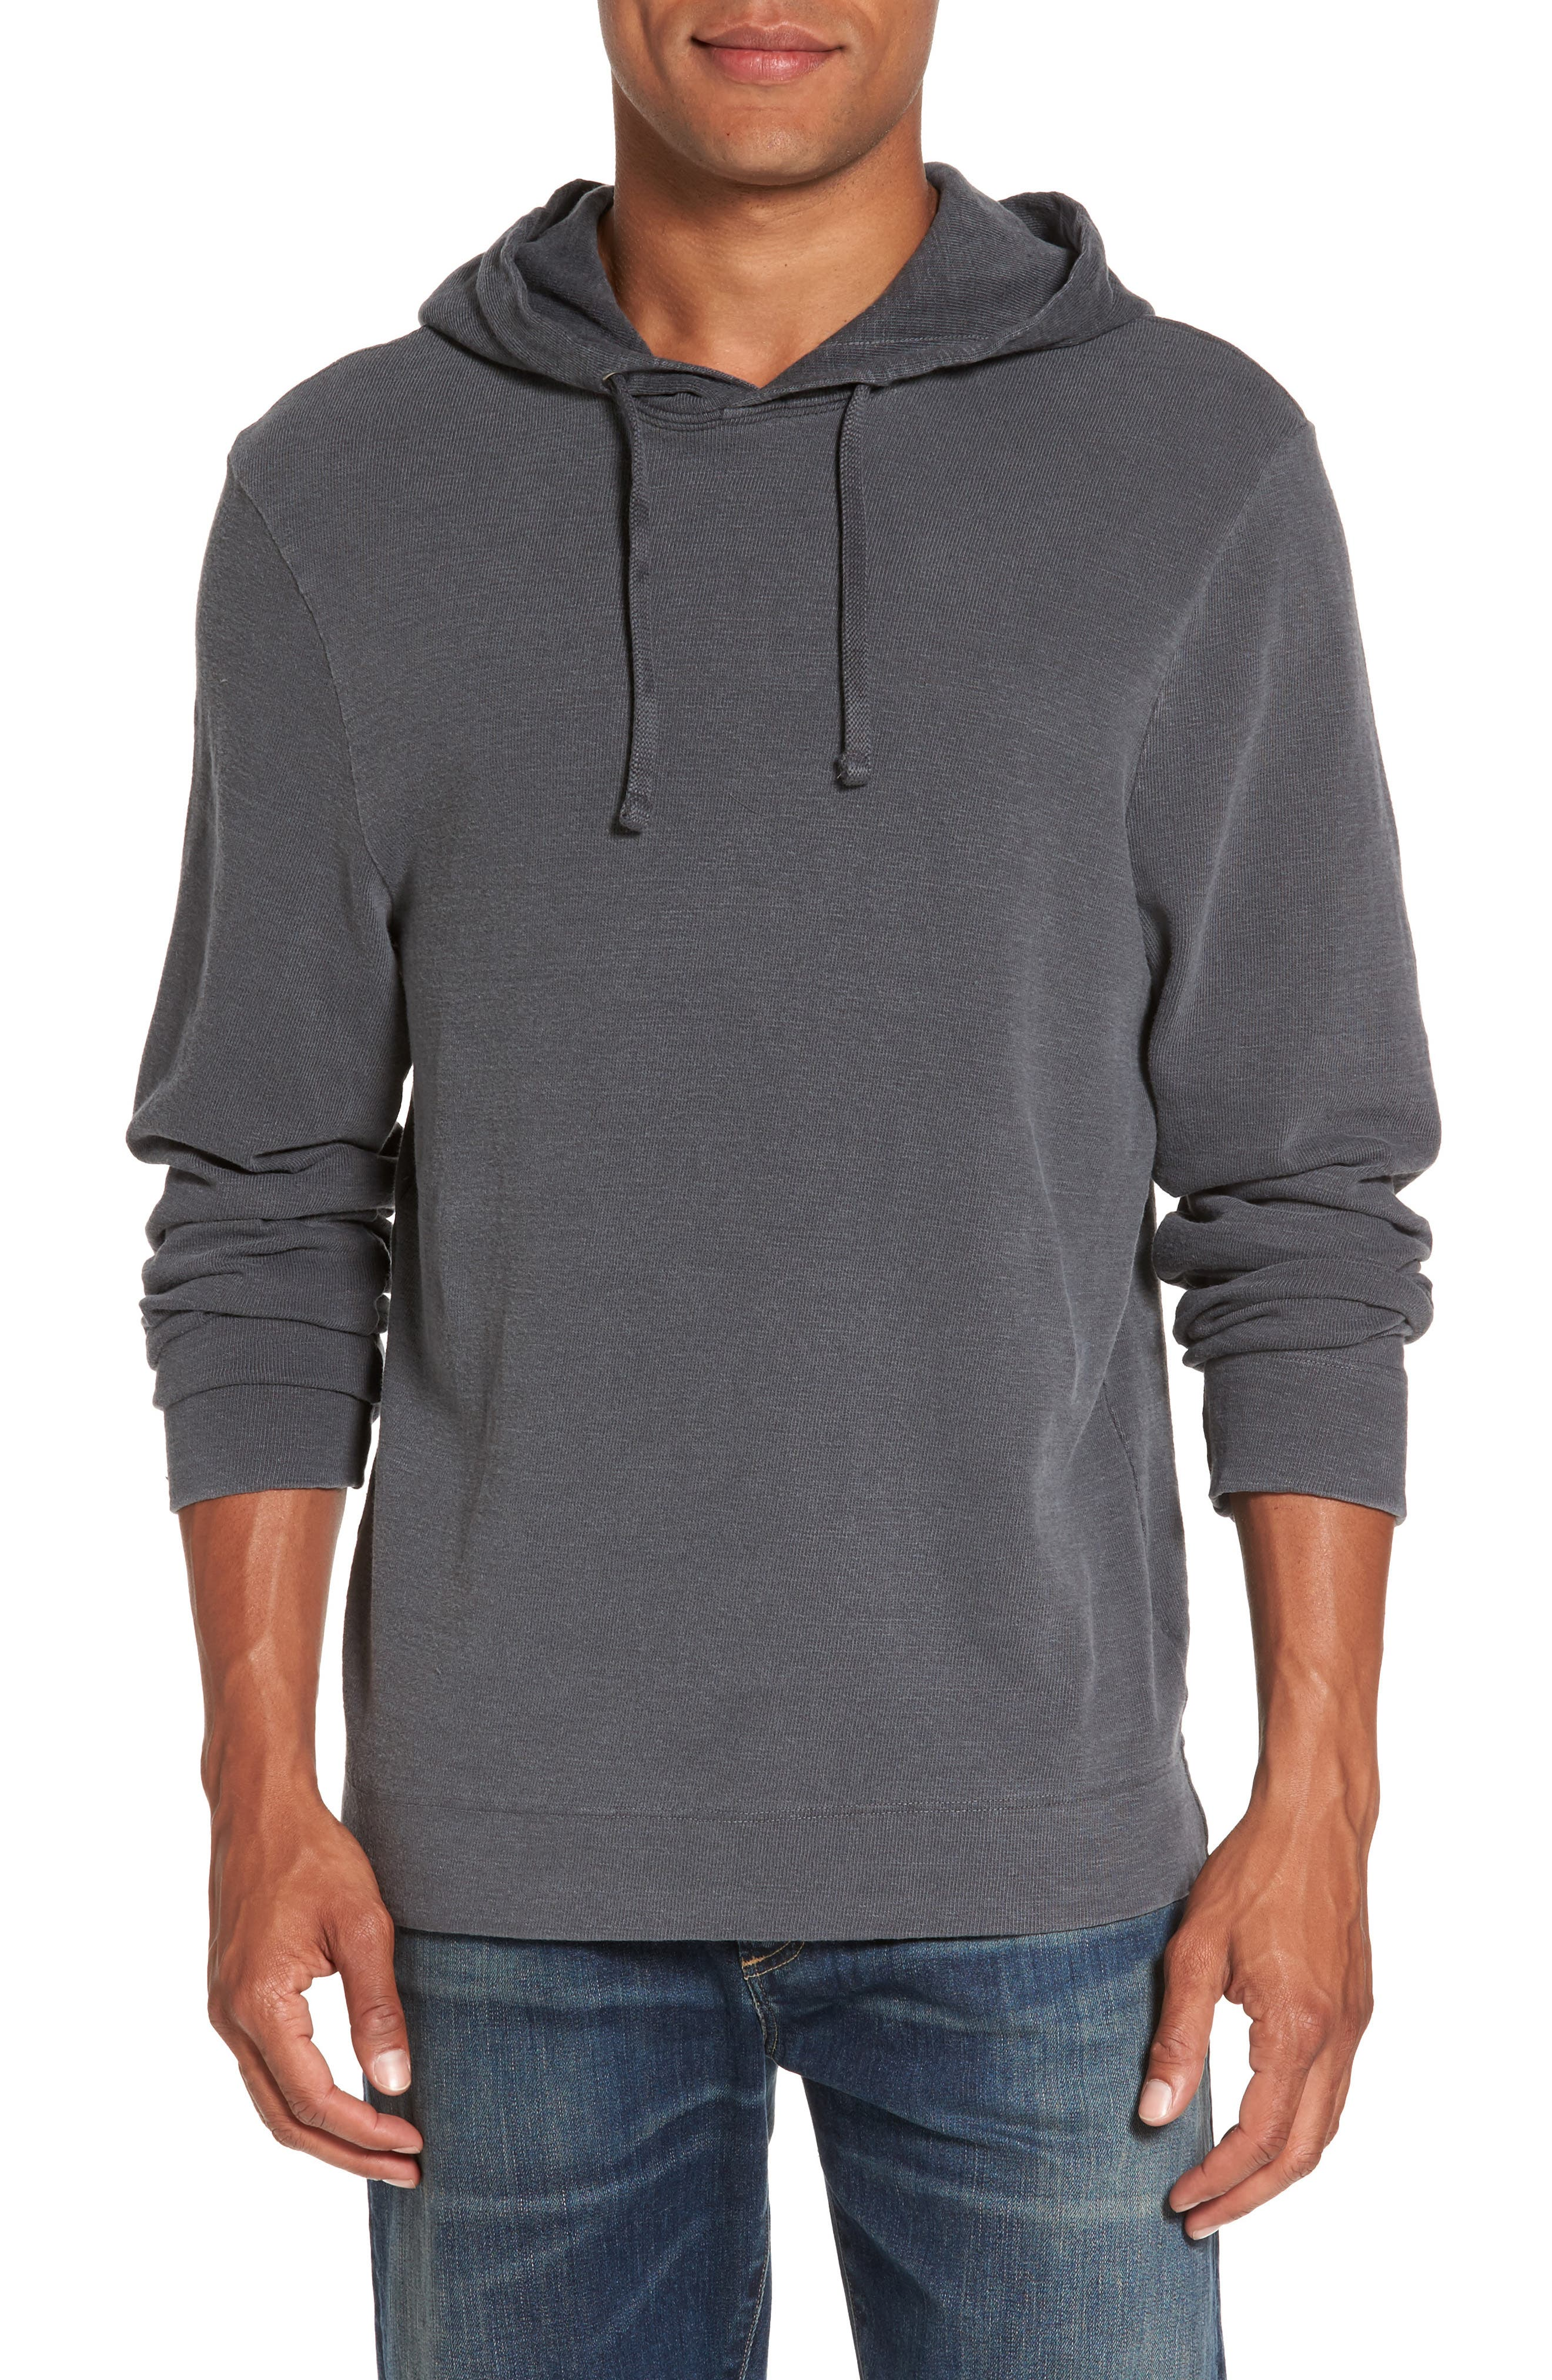 James Perse Standard Fit Pullover Hoodie